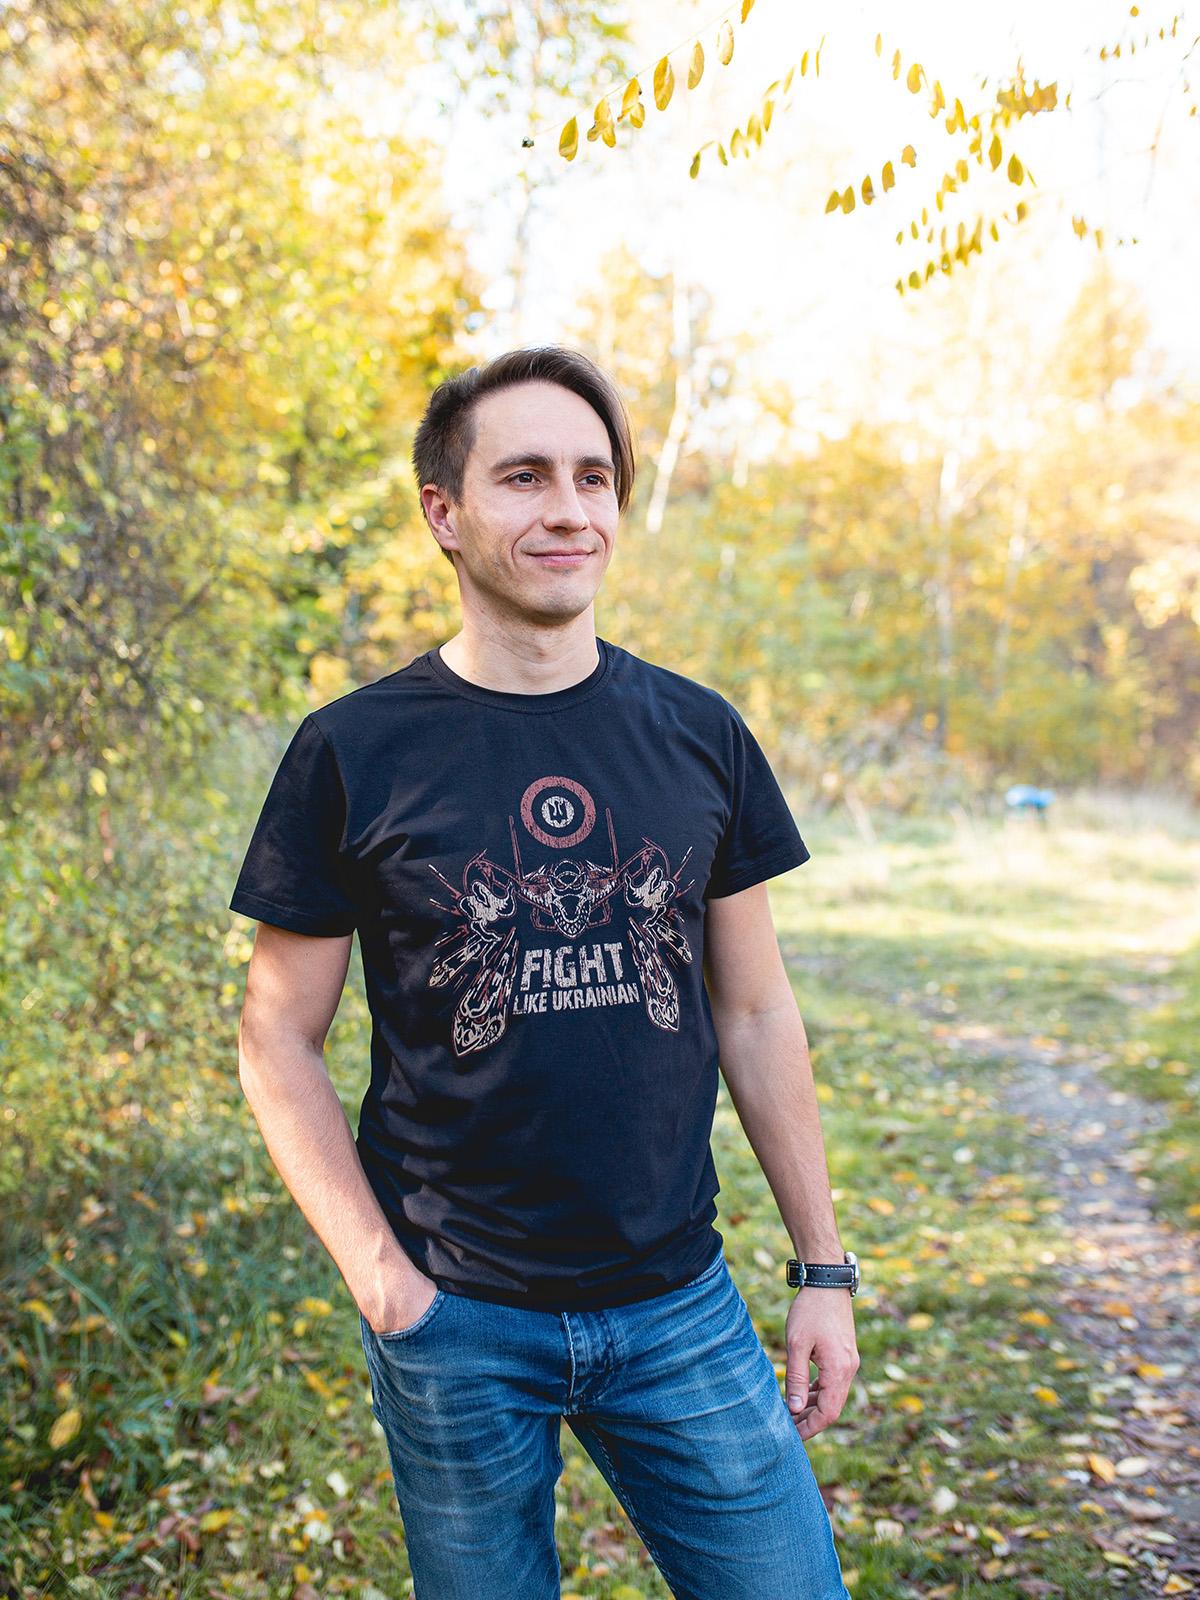 Men's T-Shirt Flu. Color black.  Size worn by the model: M.